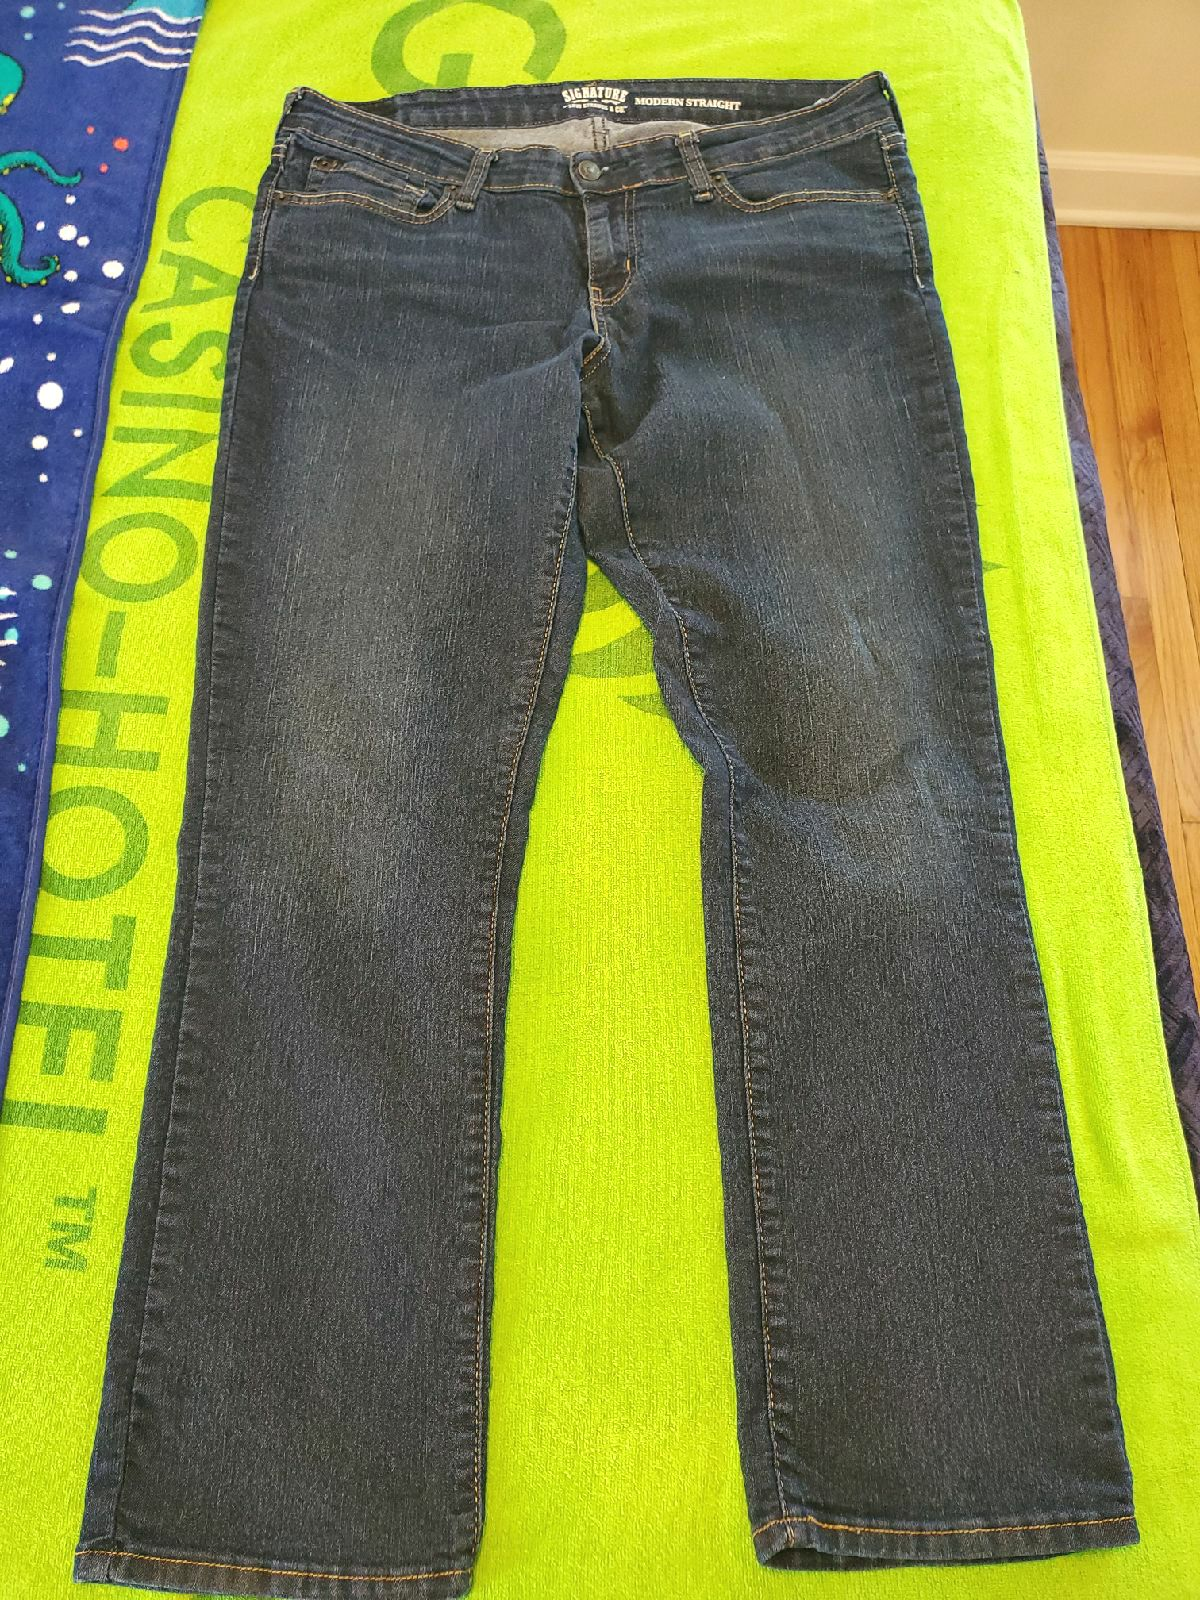 Levi Women's Jeans/16.